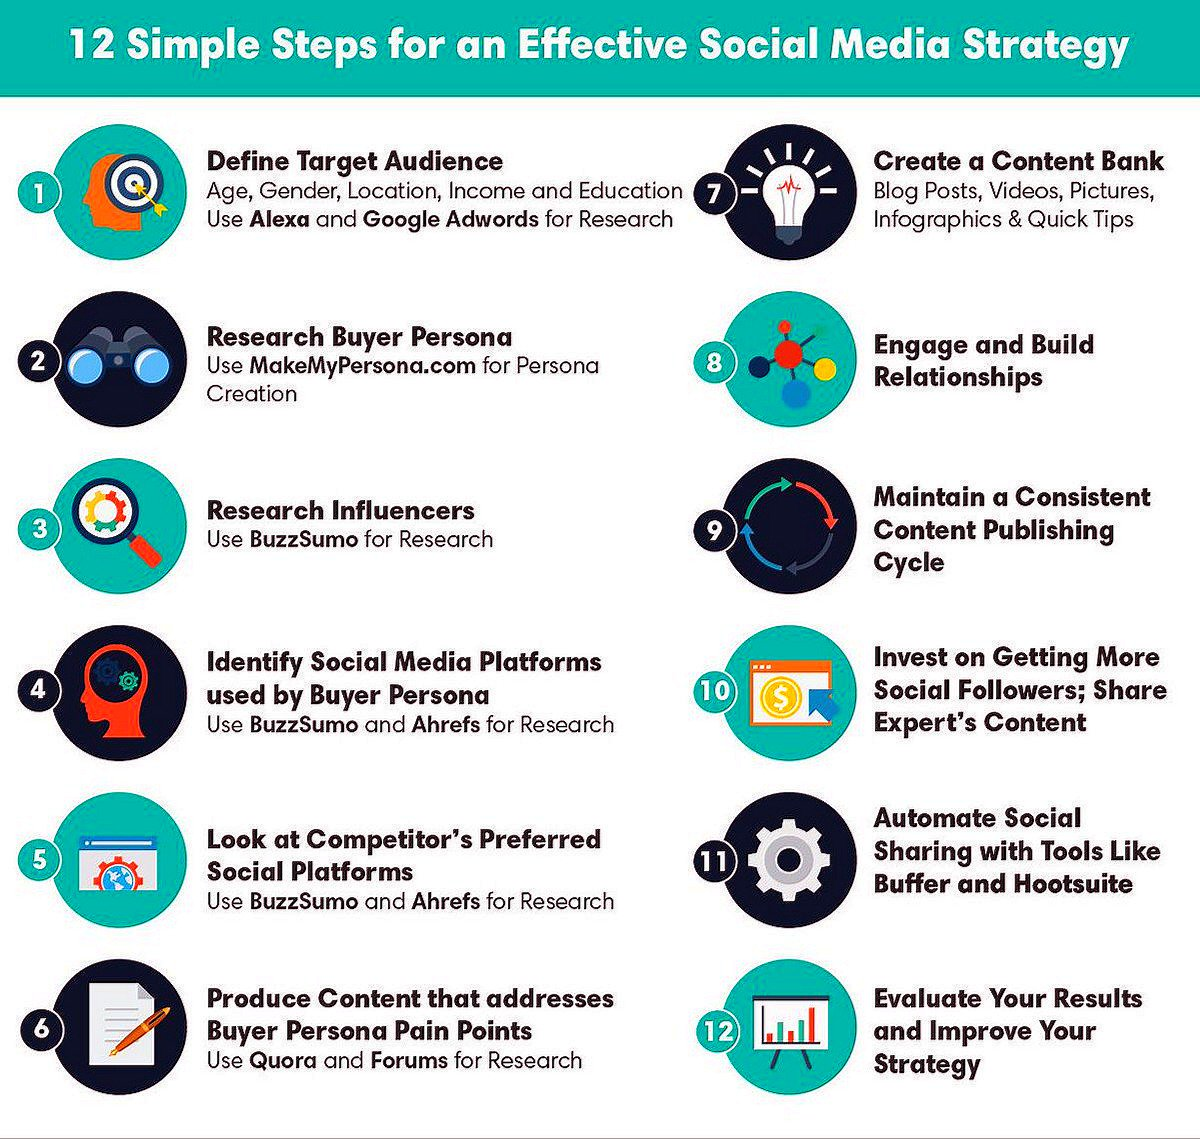 12 Simple Steps to Build Your Effective #SocialMedia Strategy #INFOGRAPHIC  #GrowthHacking #SocialMediaMarketing #SMM #makeyourownlane<br>http://pic.twitter.com/4rVNmcxc7k